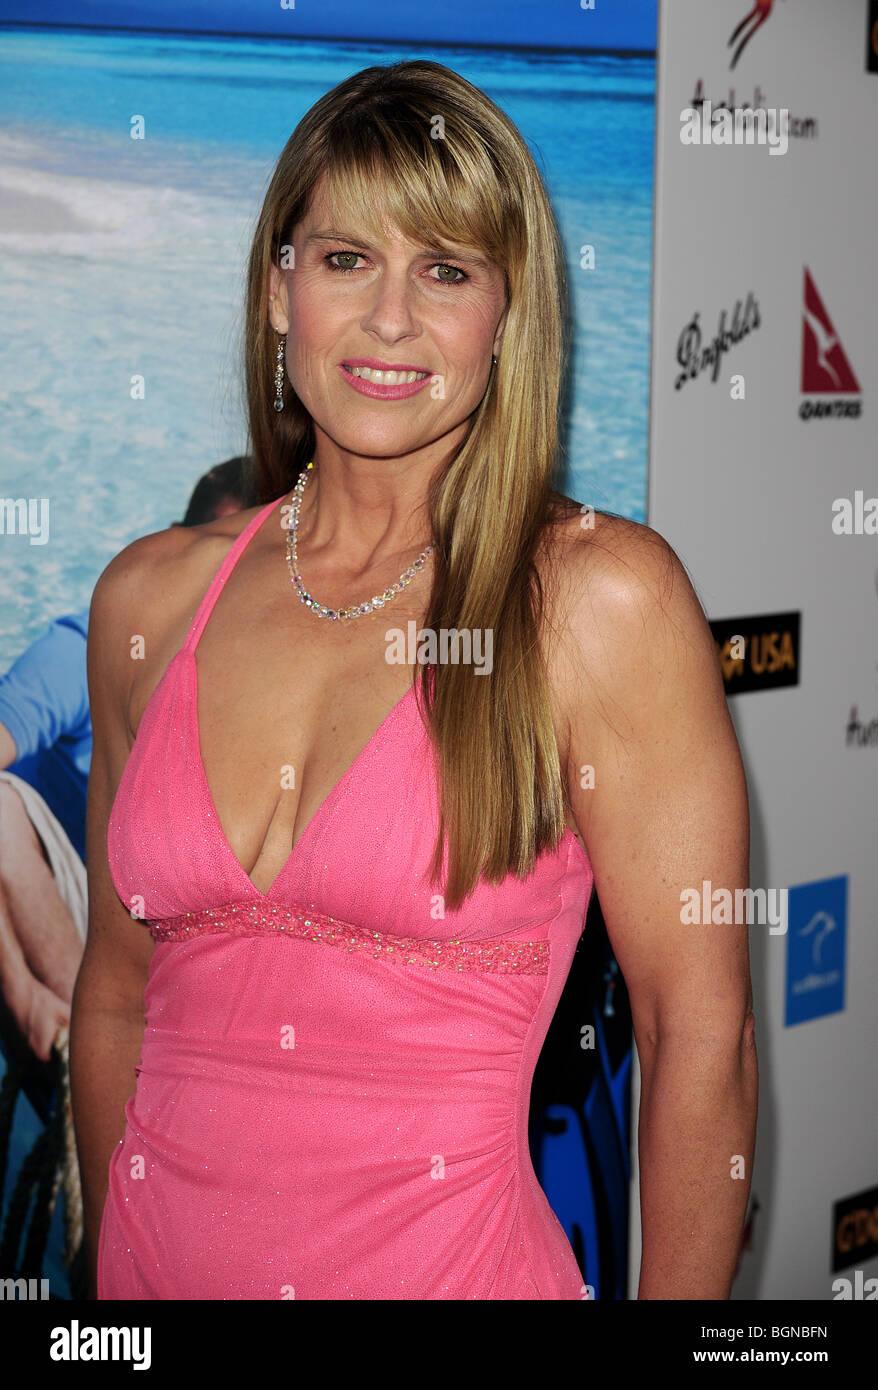 Nancy Anne Sakovich,Florence Lake Erotic pics & movies Diane Brewster,Brianne Prather